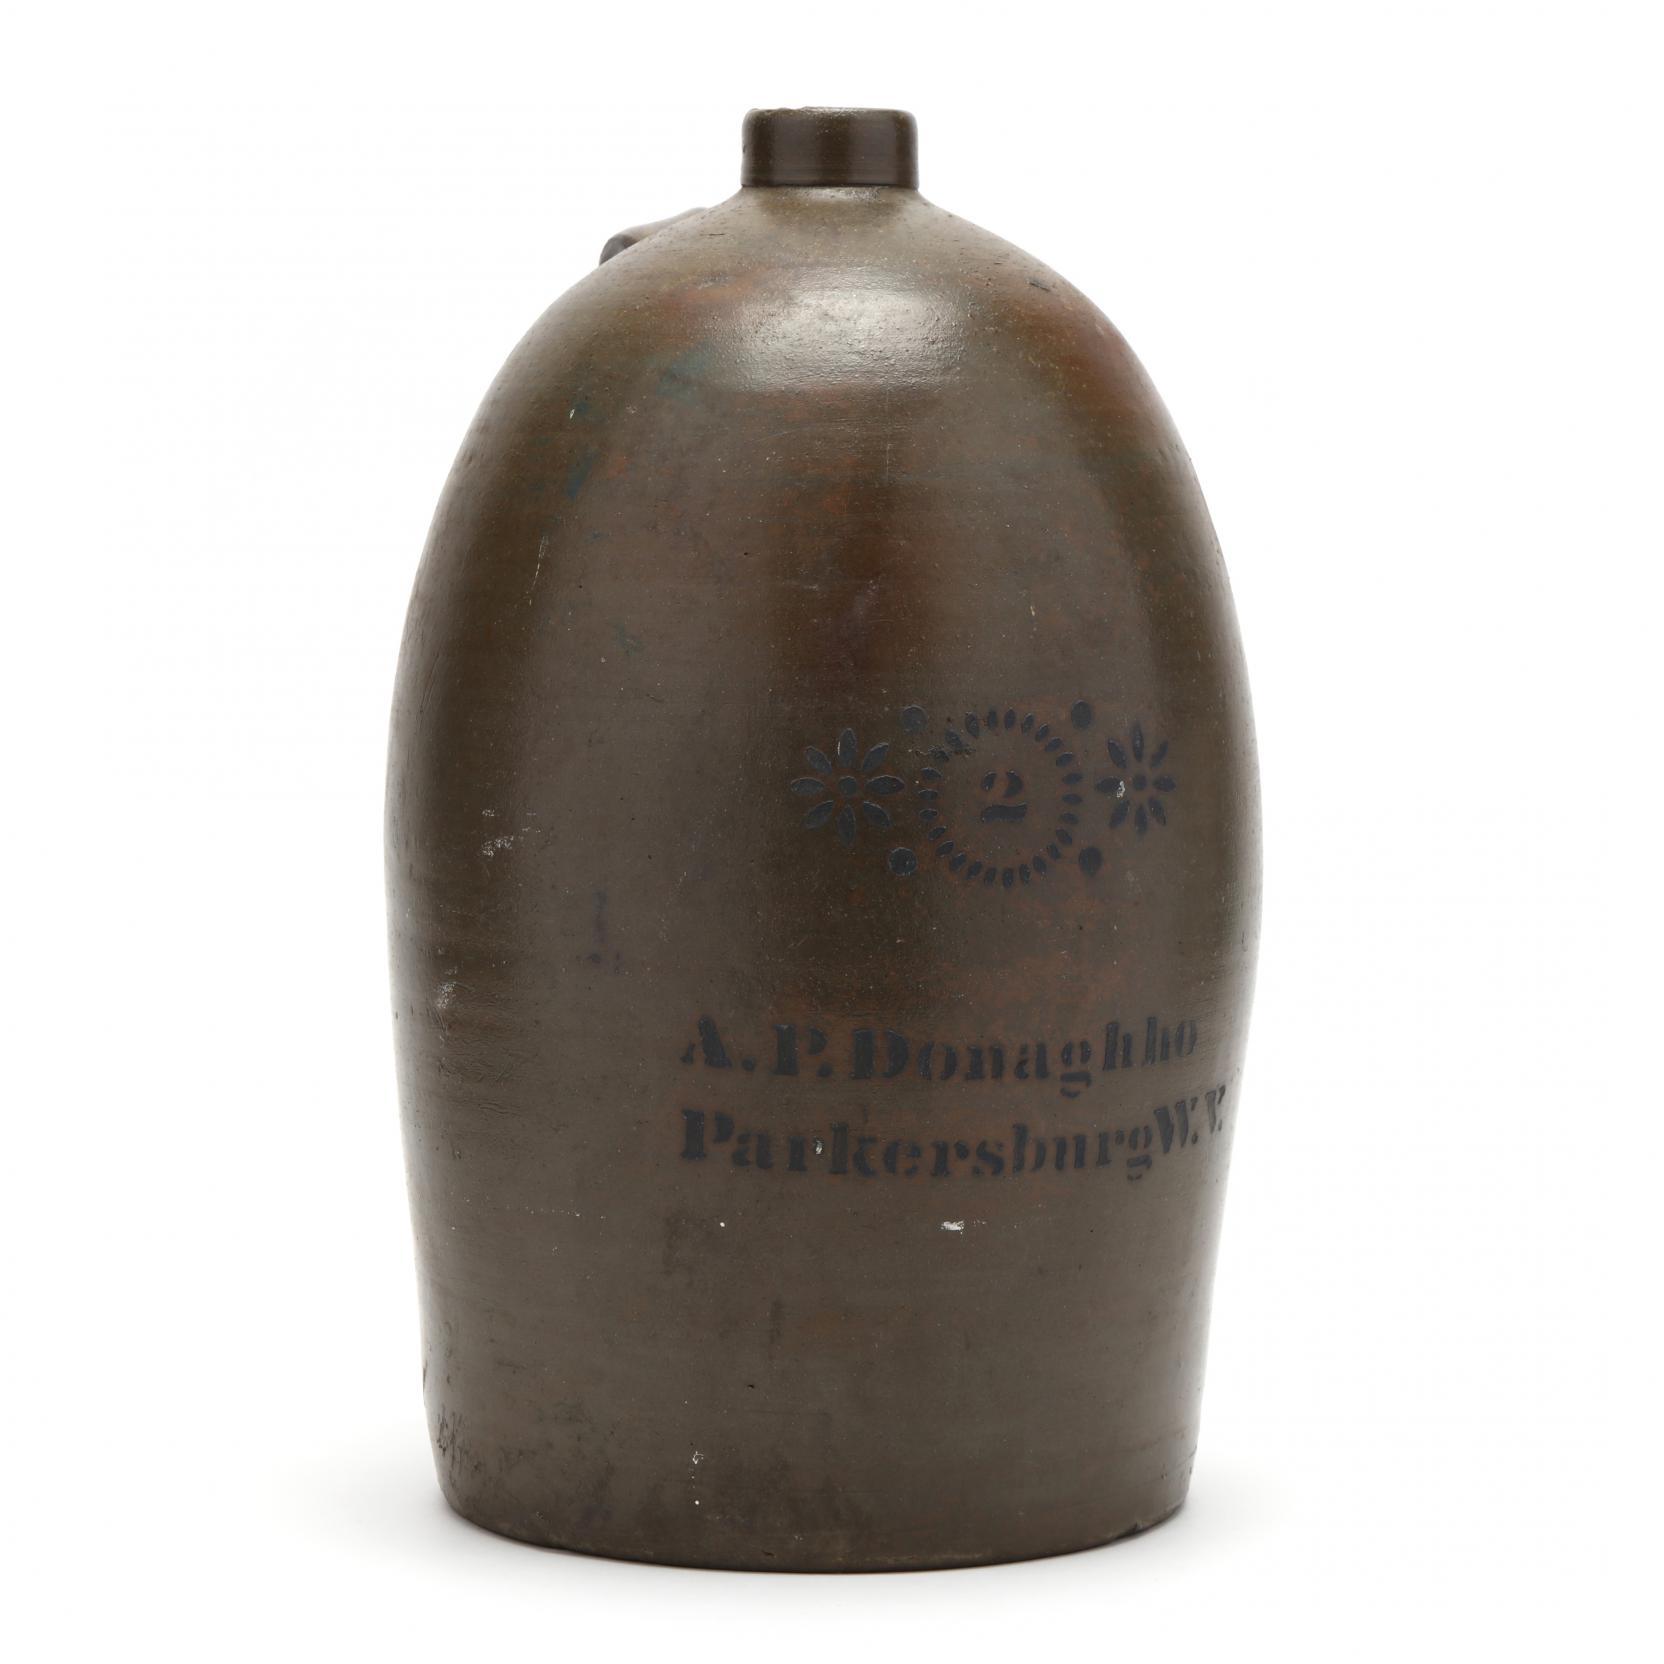 west-virginia-two-gallon-crock-a-p-donaghho